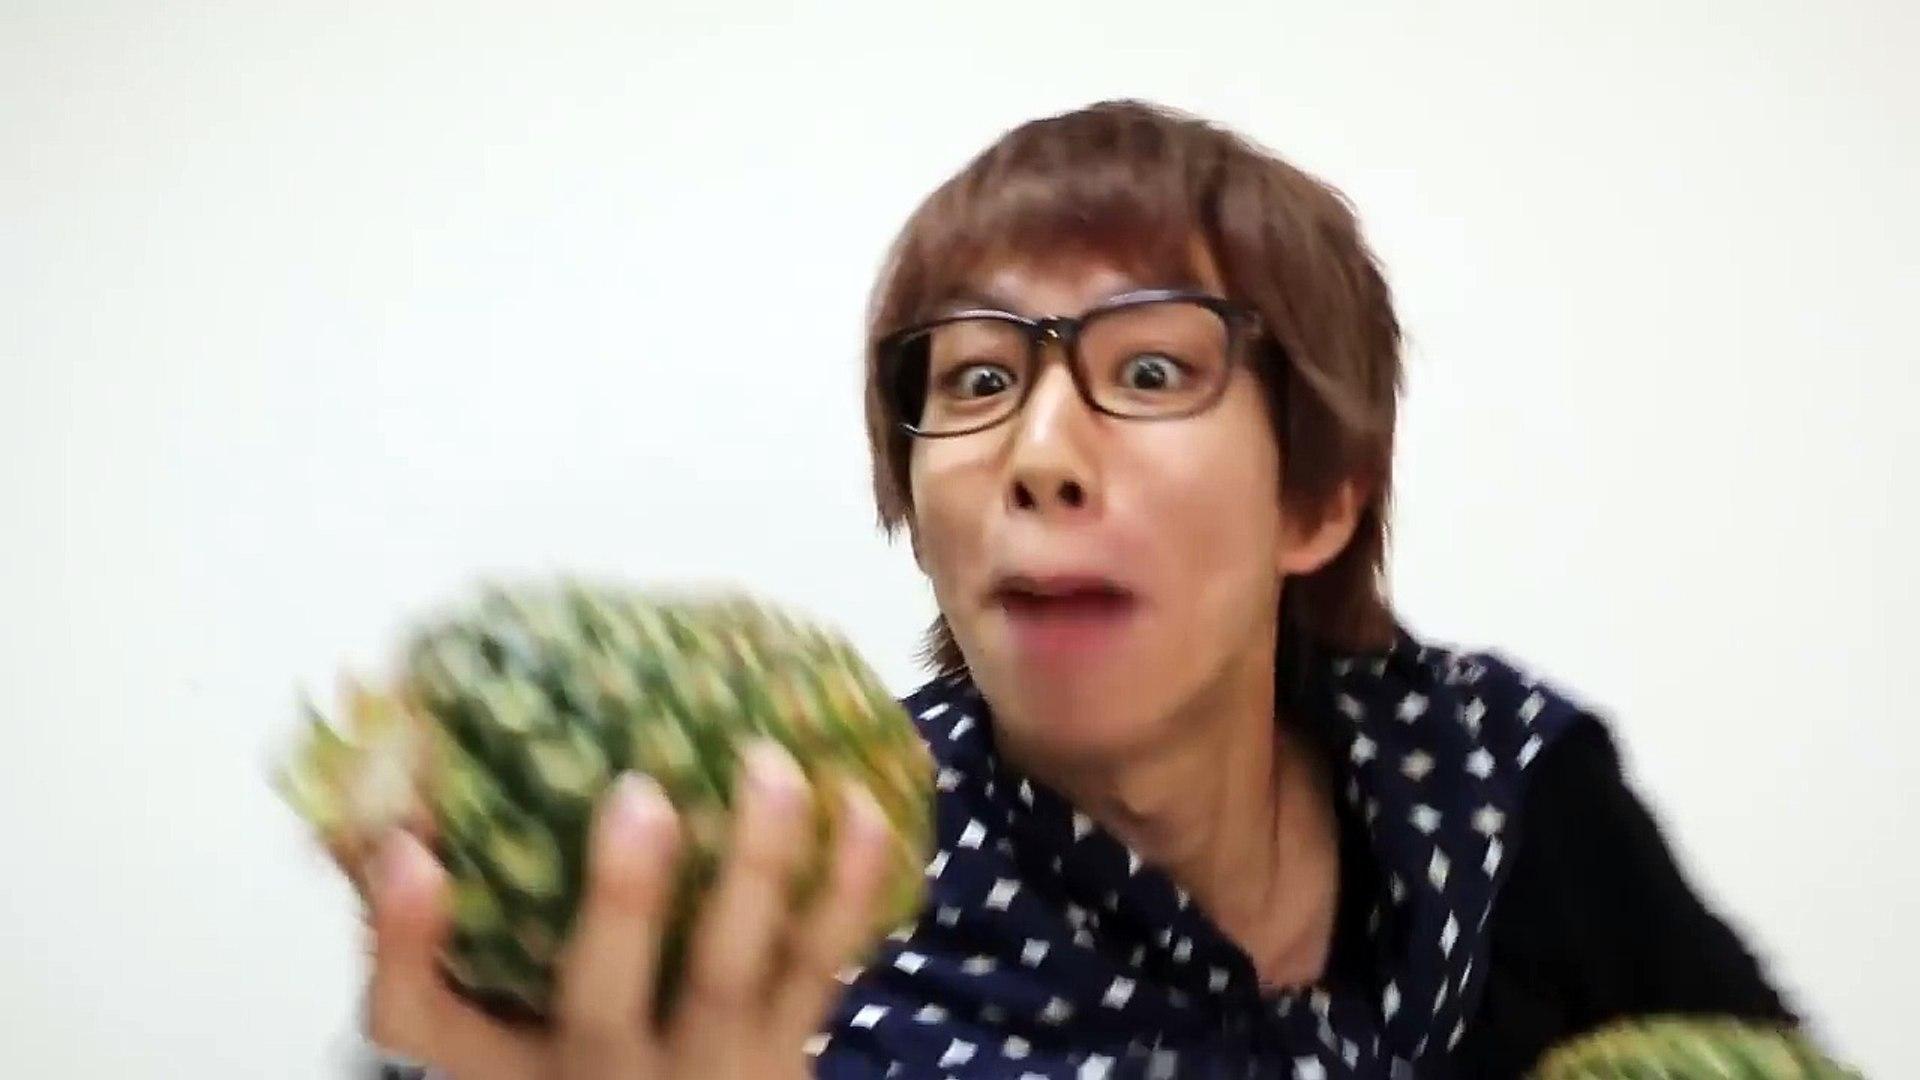 TOP 5 FUNNY PPAP Parodies! | Pen Pineapple Apple Pen Parody (PPAP Song Cover)